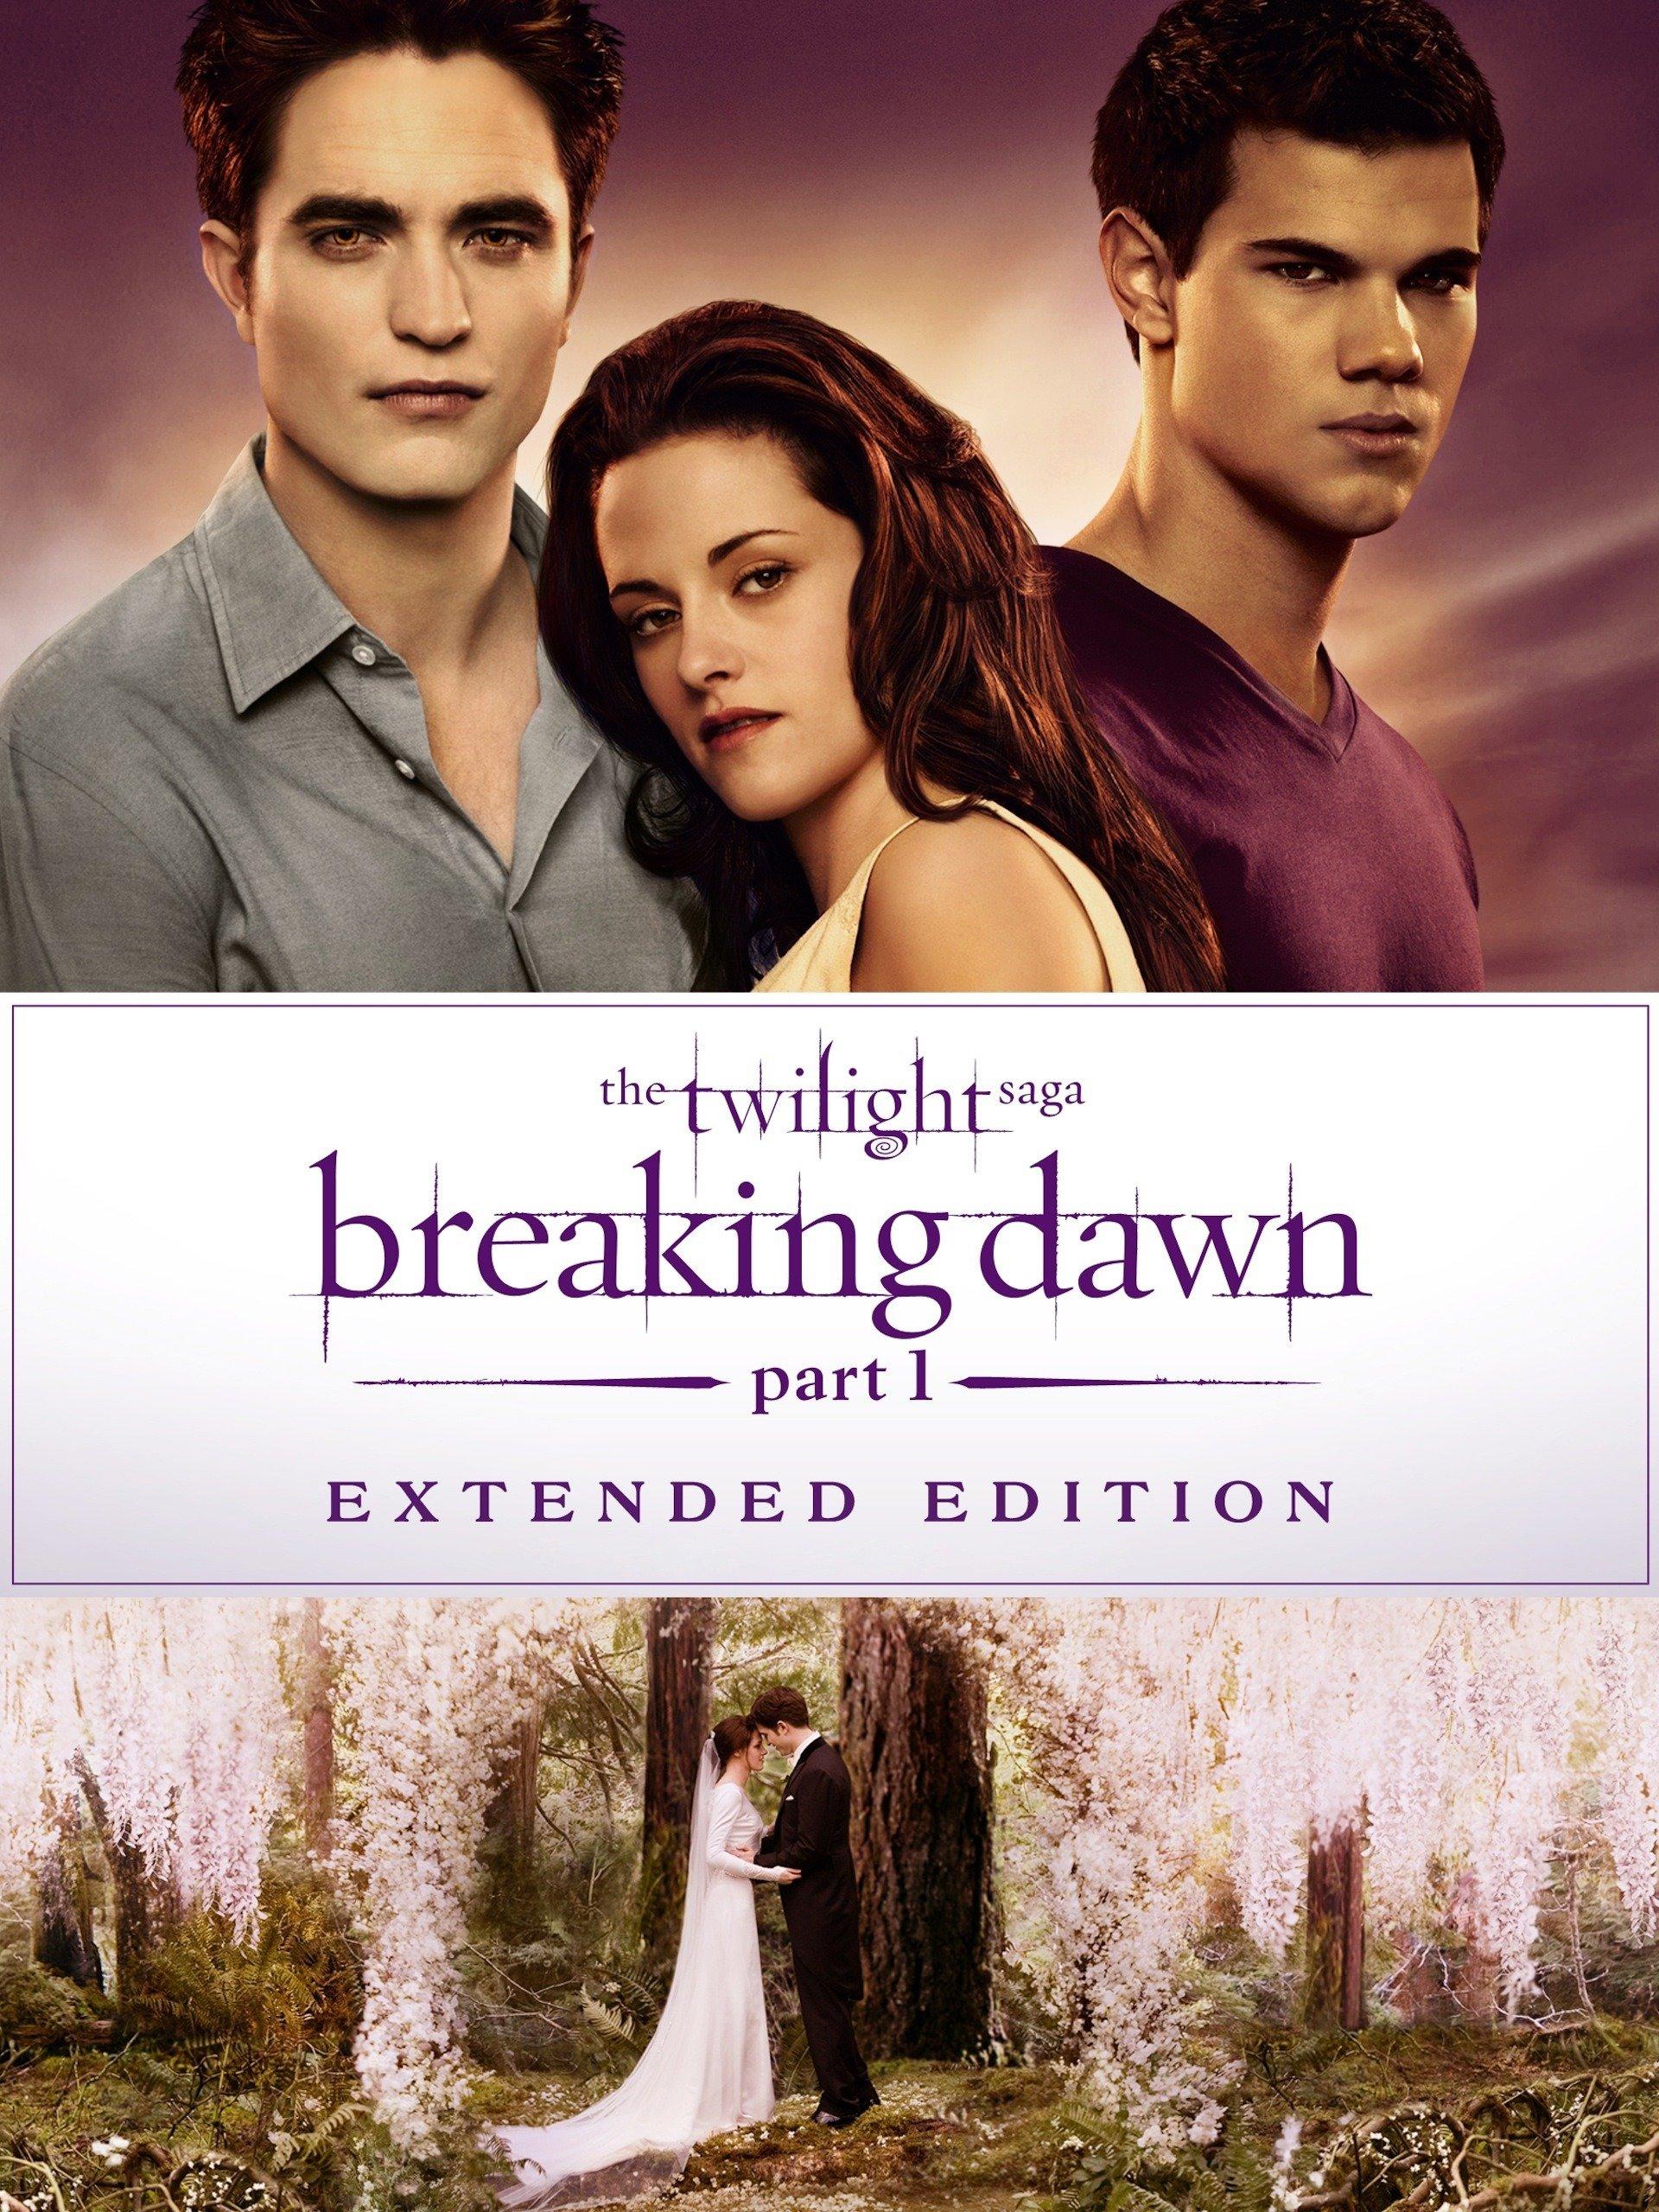 Twilight Saga Breaking Dawn - Part1 - Extended